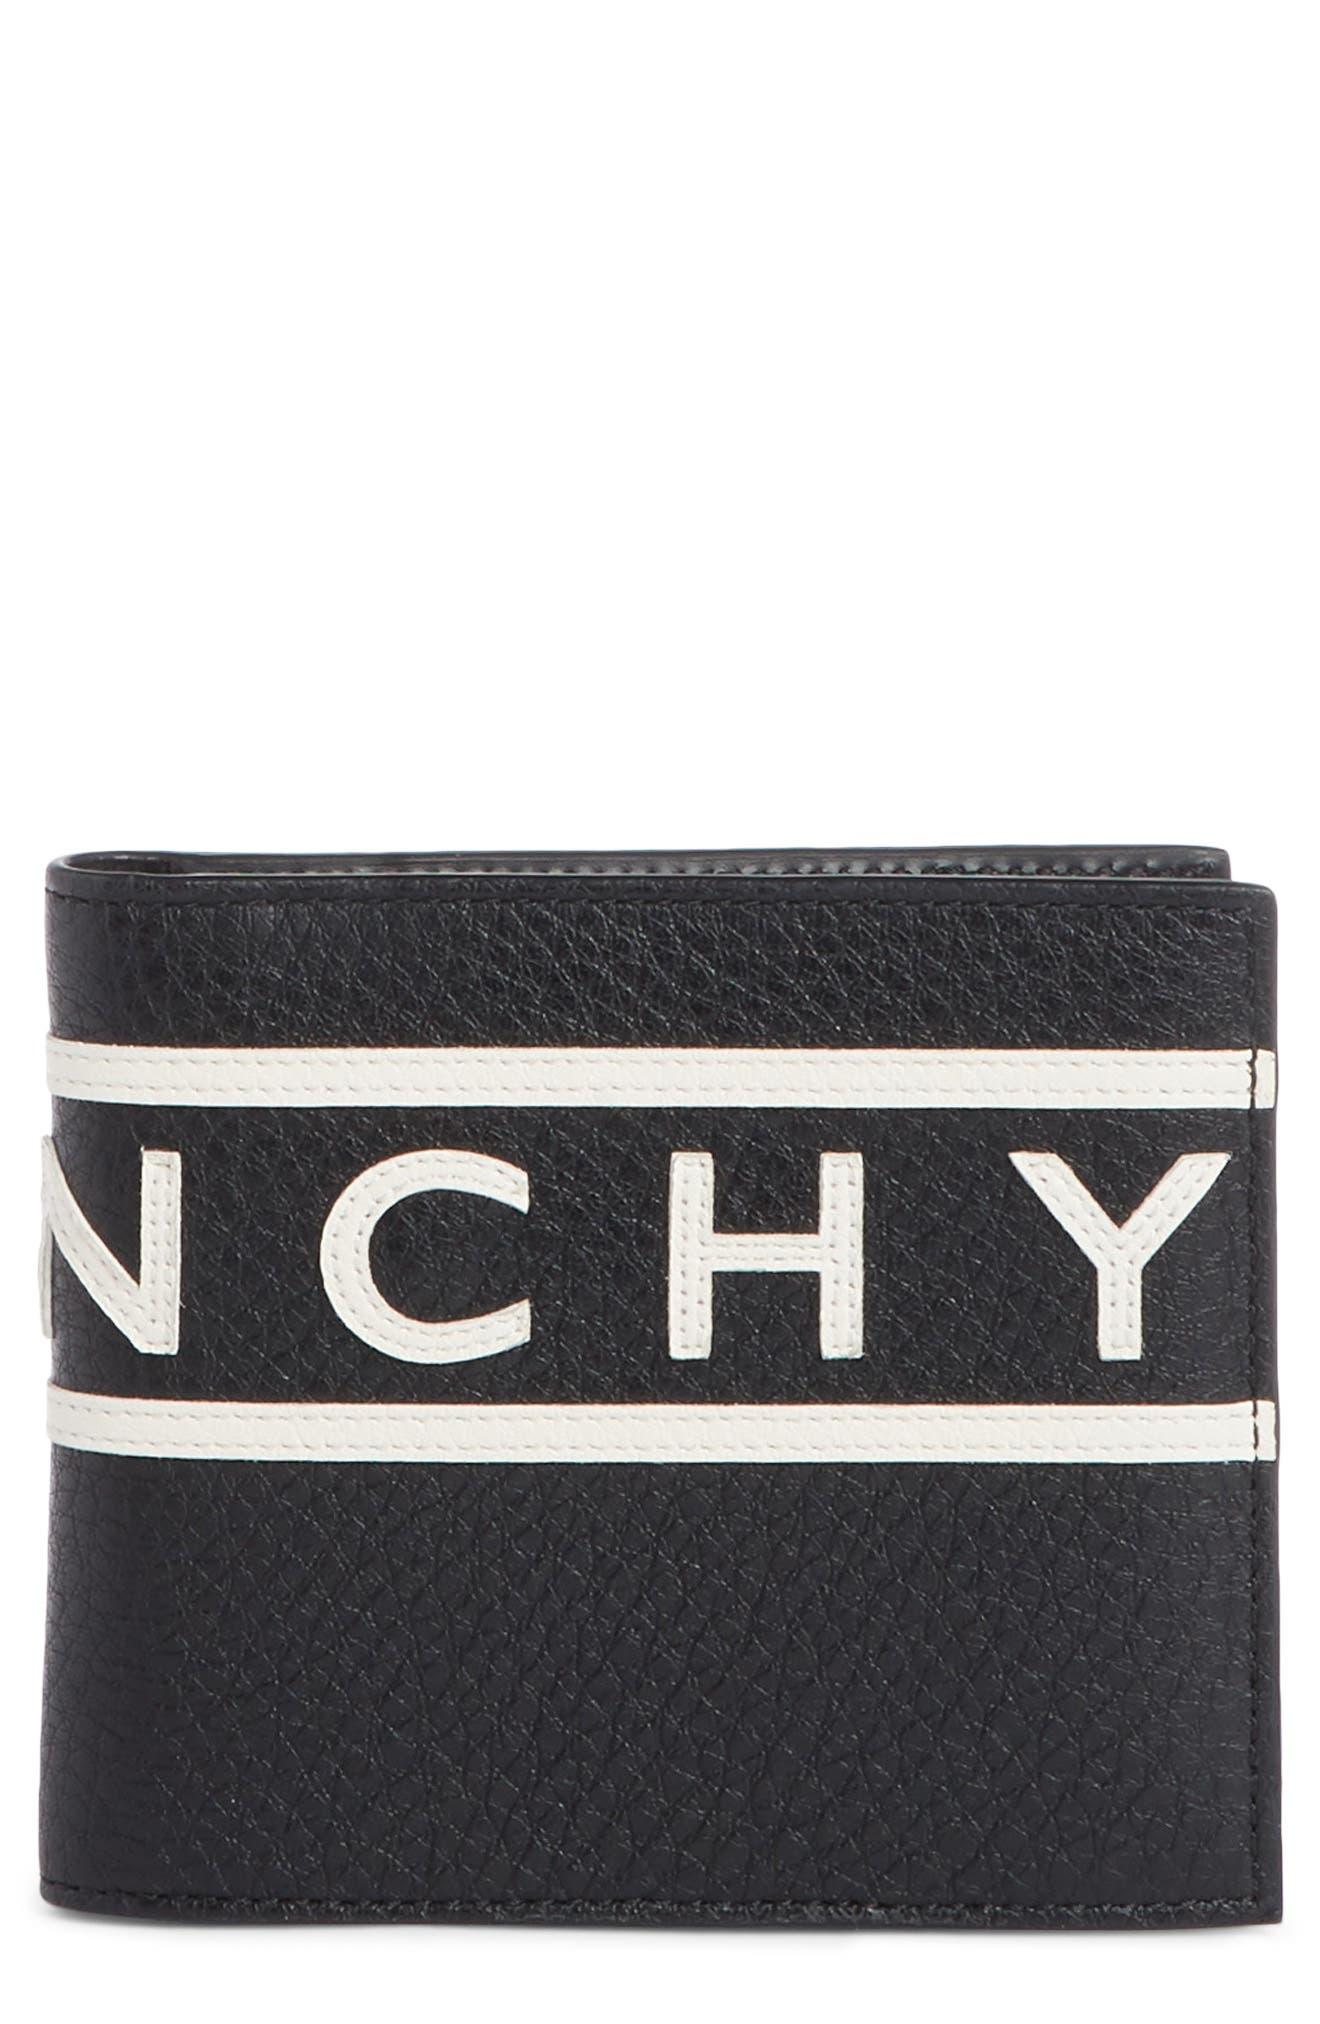 GIVENCHY Logo Calfskin Leather Wallet, Main, color, BLACK